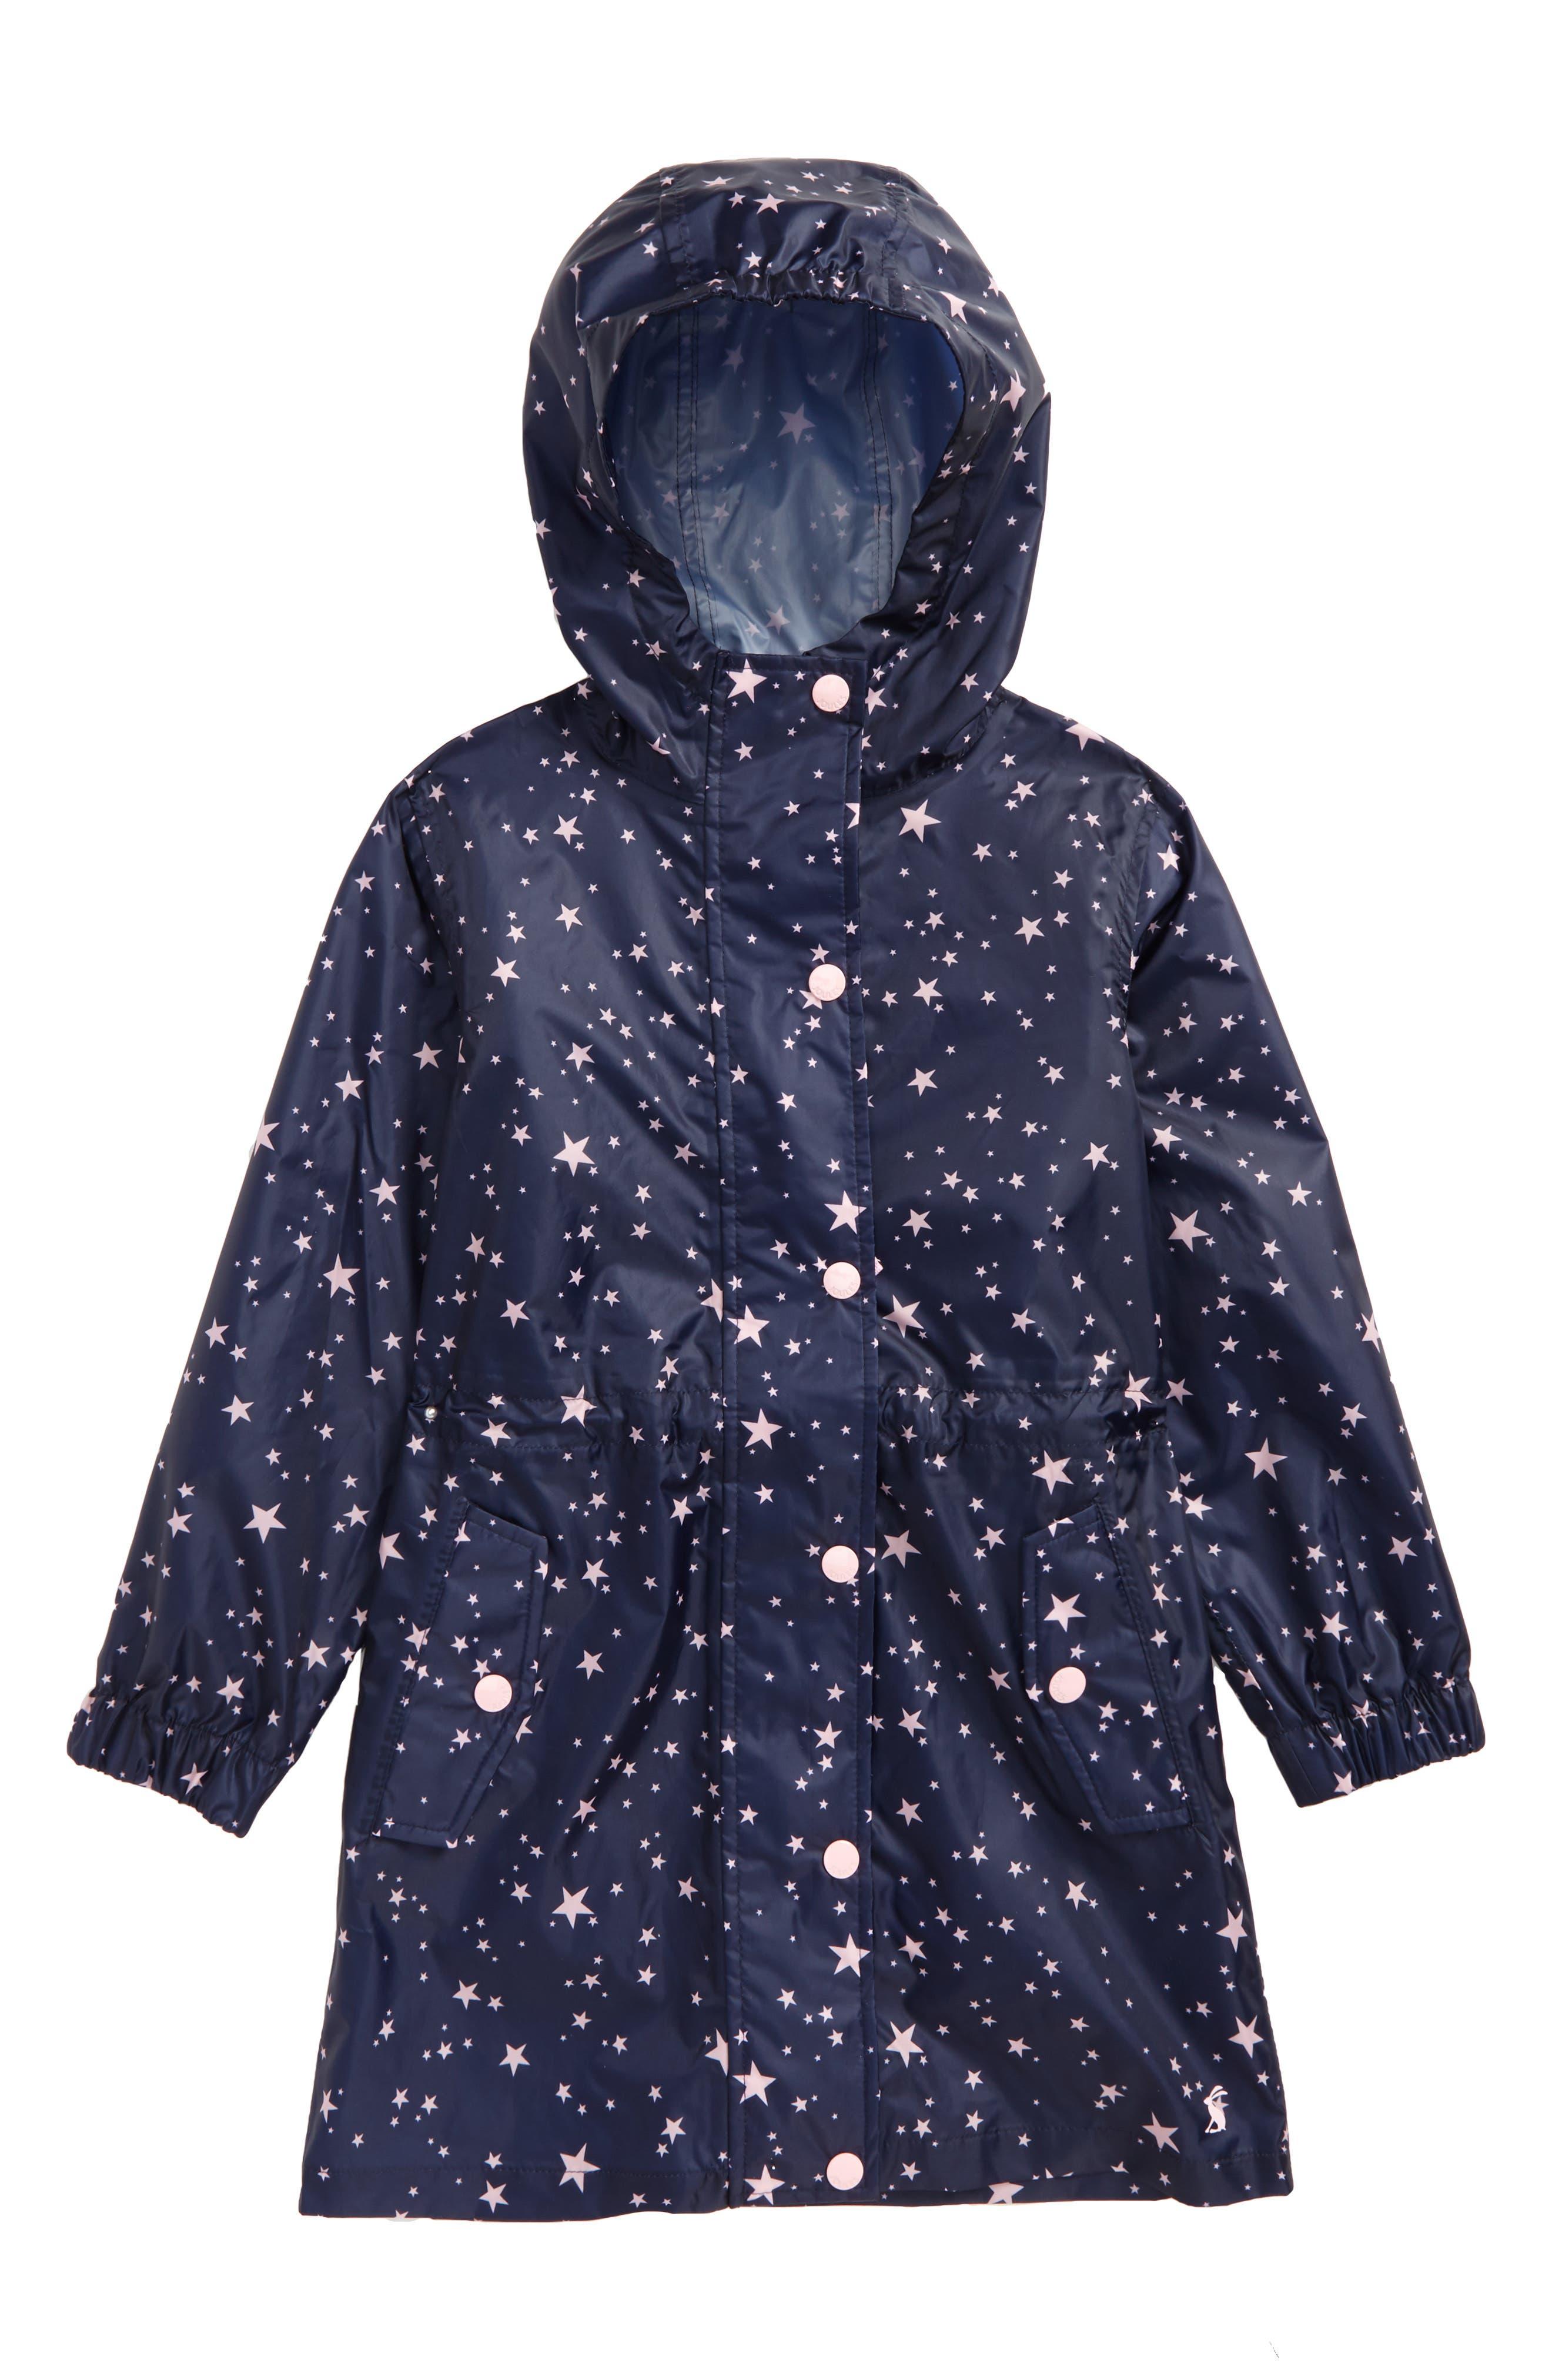 Main Image - Joules Print Packaway Rain Coat (Toddler Girls, Little Girls & Big Girls)